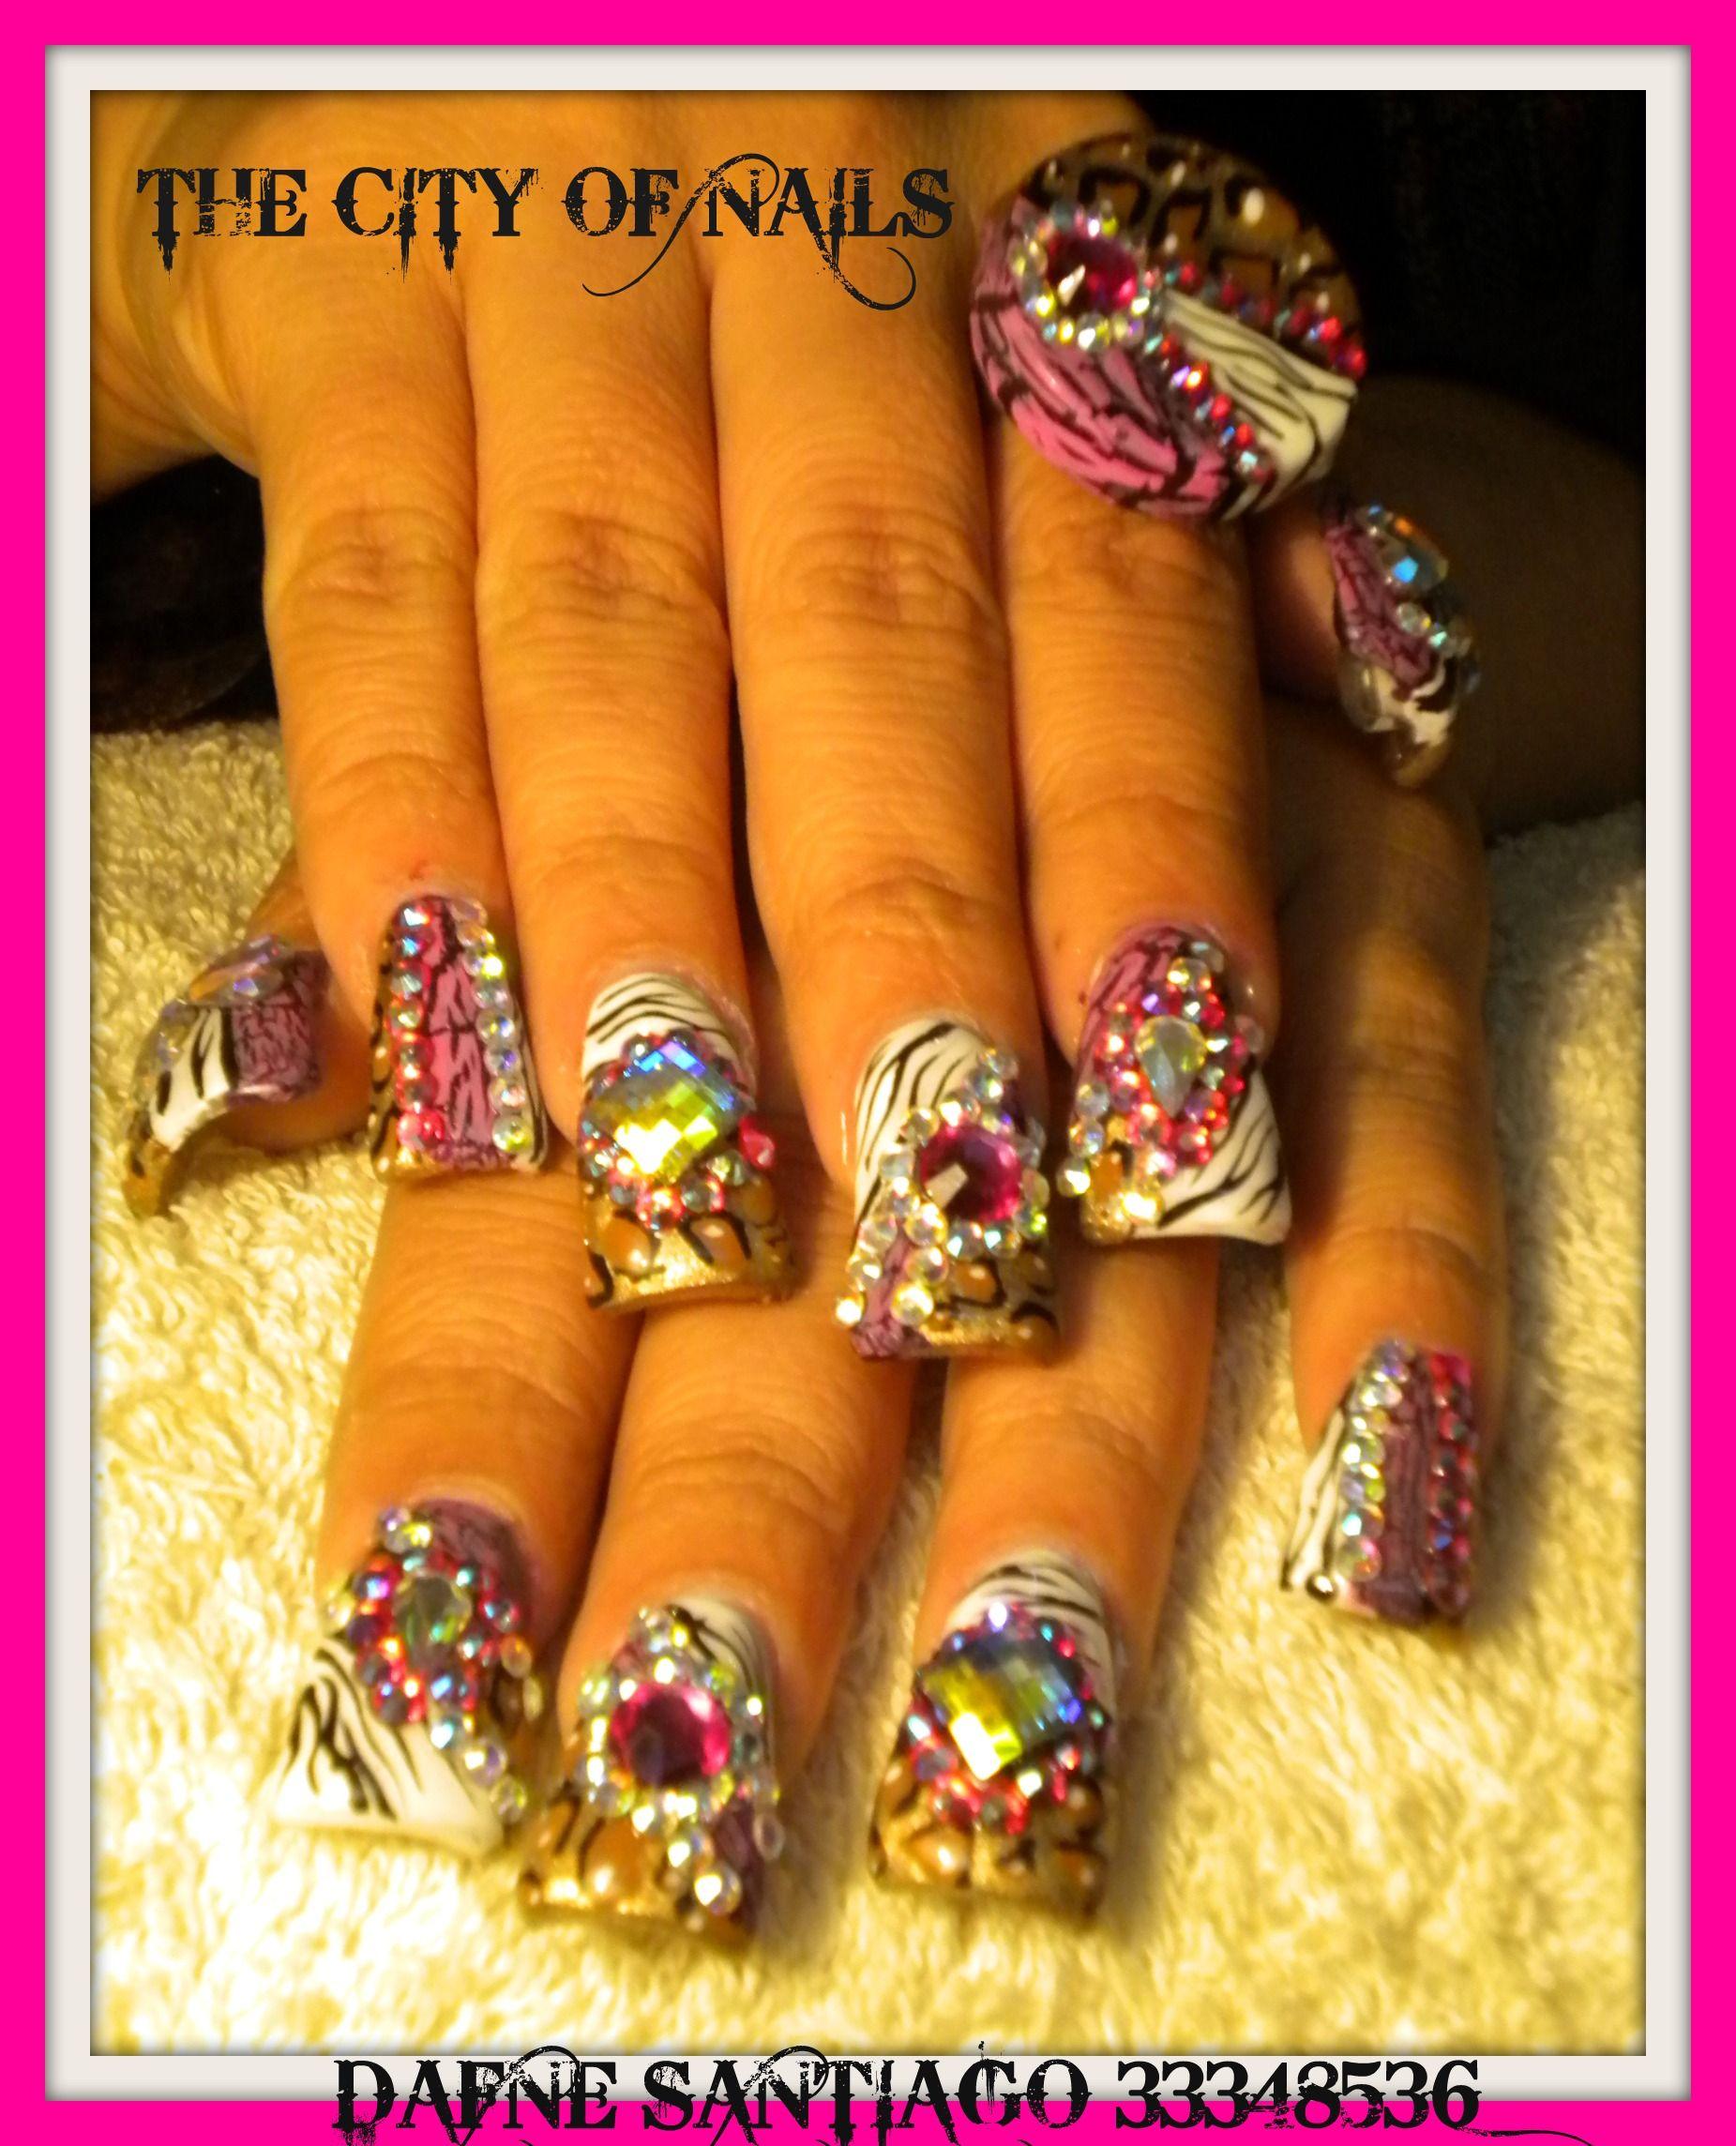 Sinaloa Nails Pictures   Flores Estilo Sinaloa Kaesca Nails Pic #19 ...